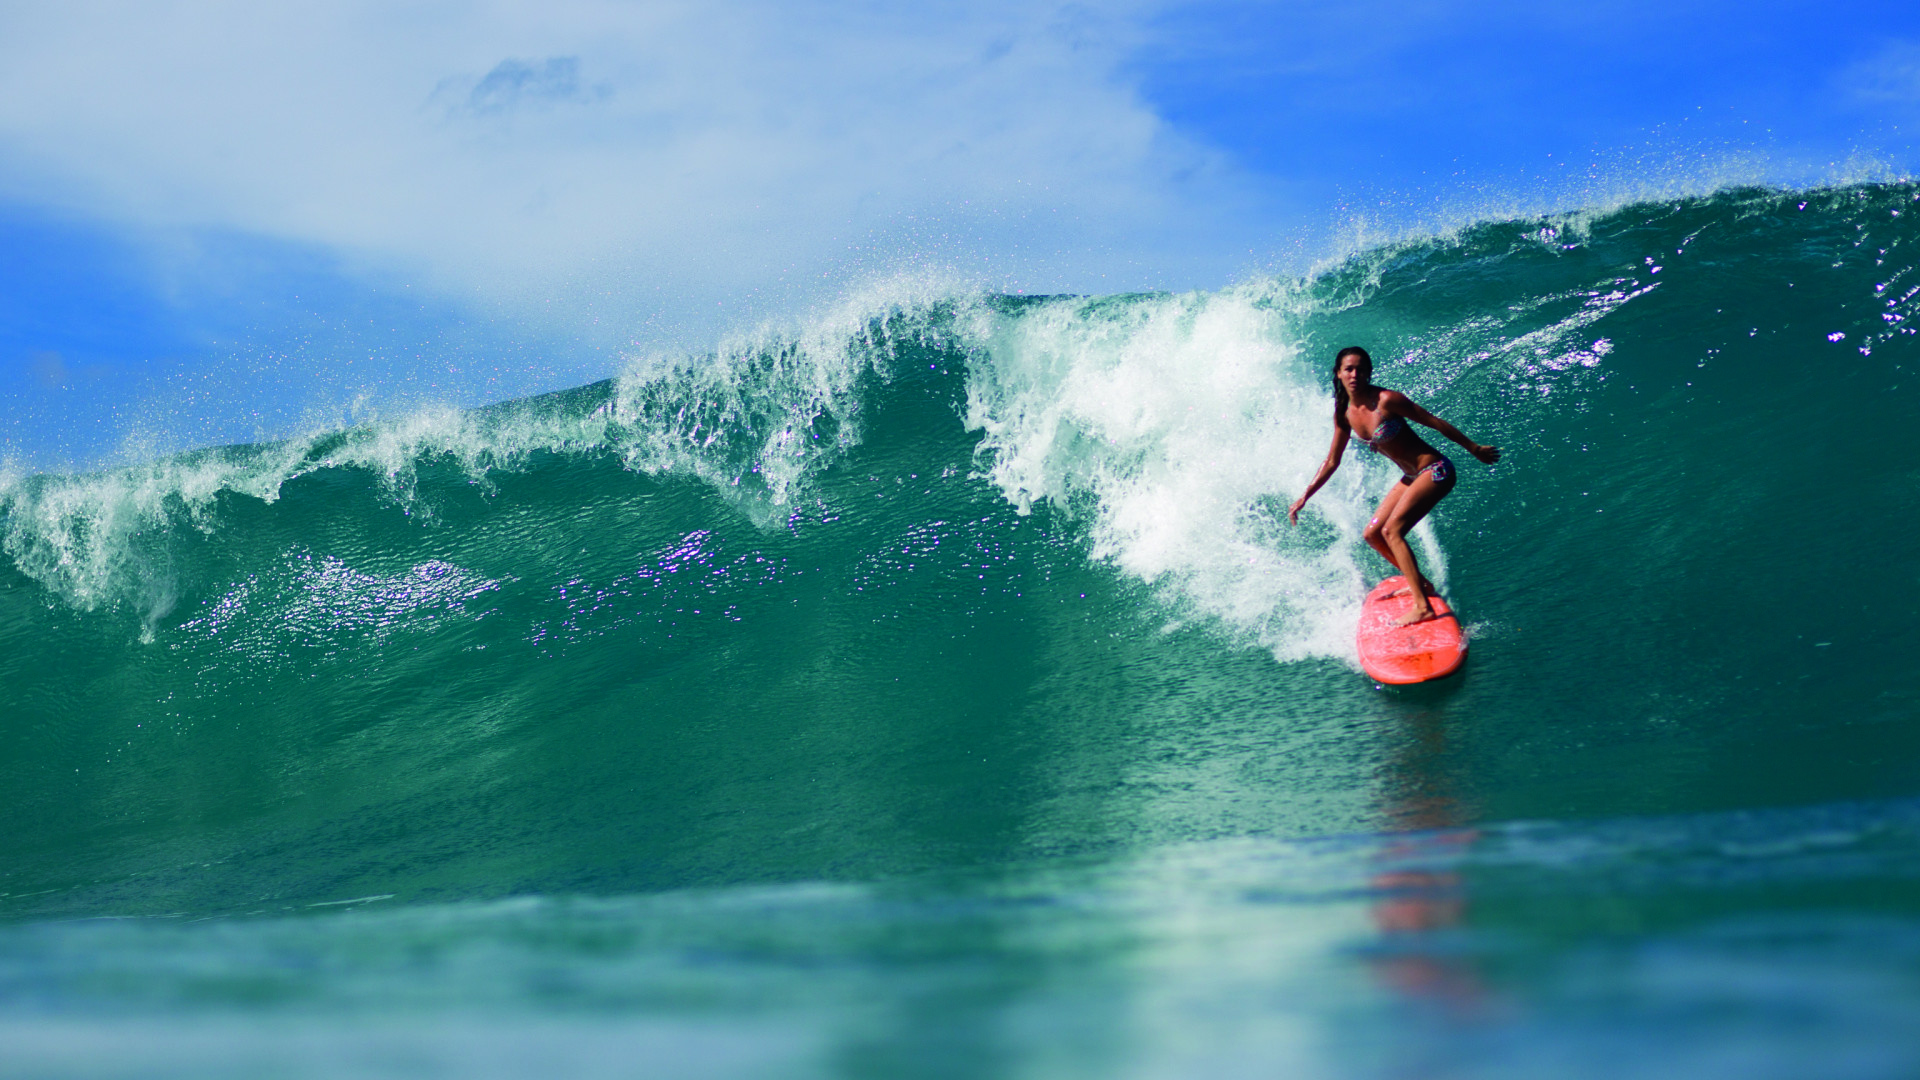 Big Waves Surfing wallpaperwallpaper screensaver .